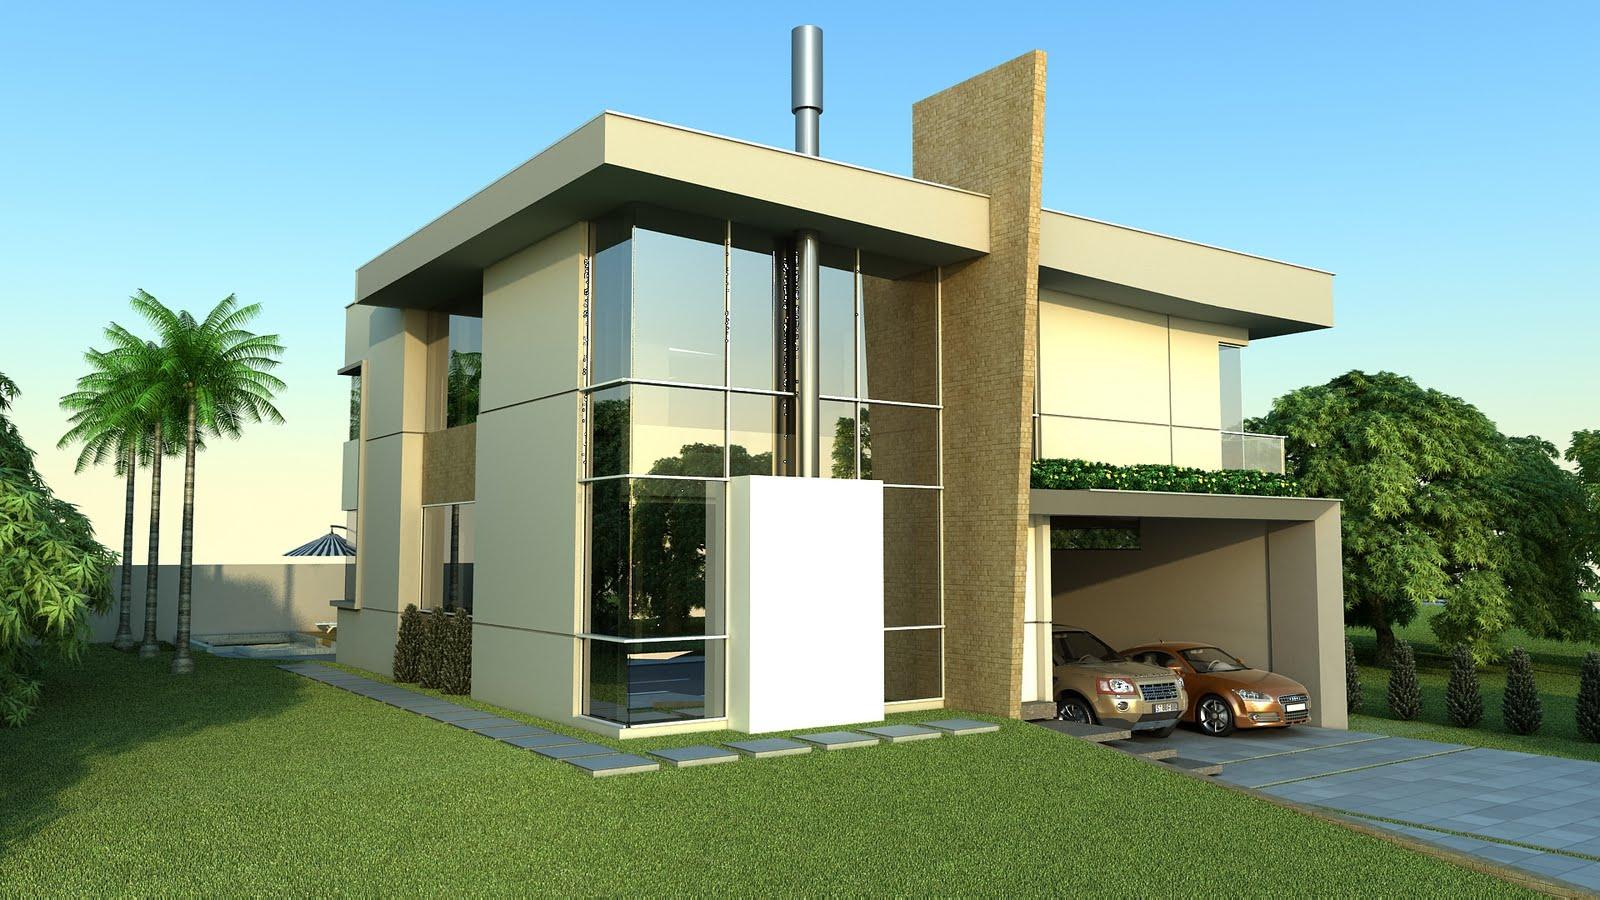 Fotos plantas de casas para construir 88